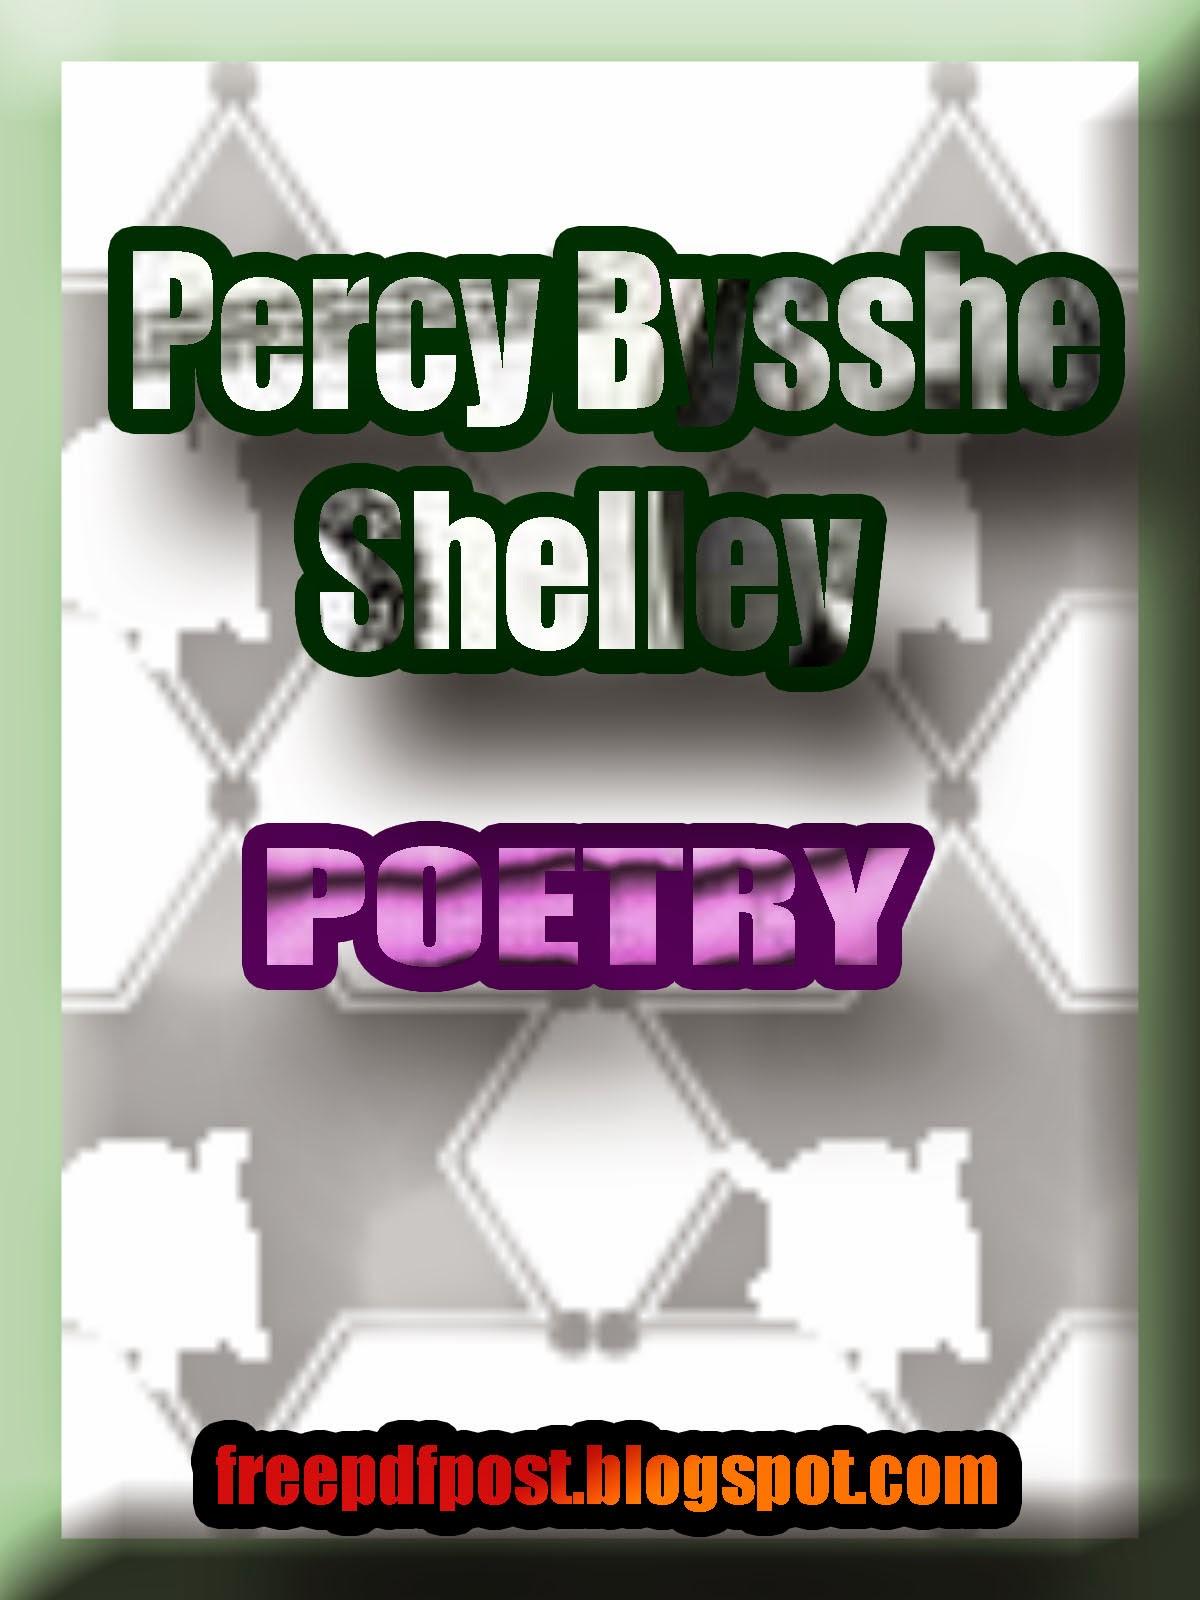 http://www.mediafire.com/view/8l2za3zl89s64q8/percy_bysshe_shelley_2004_9.pdf